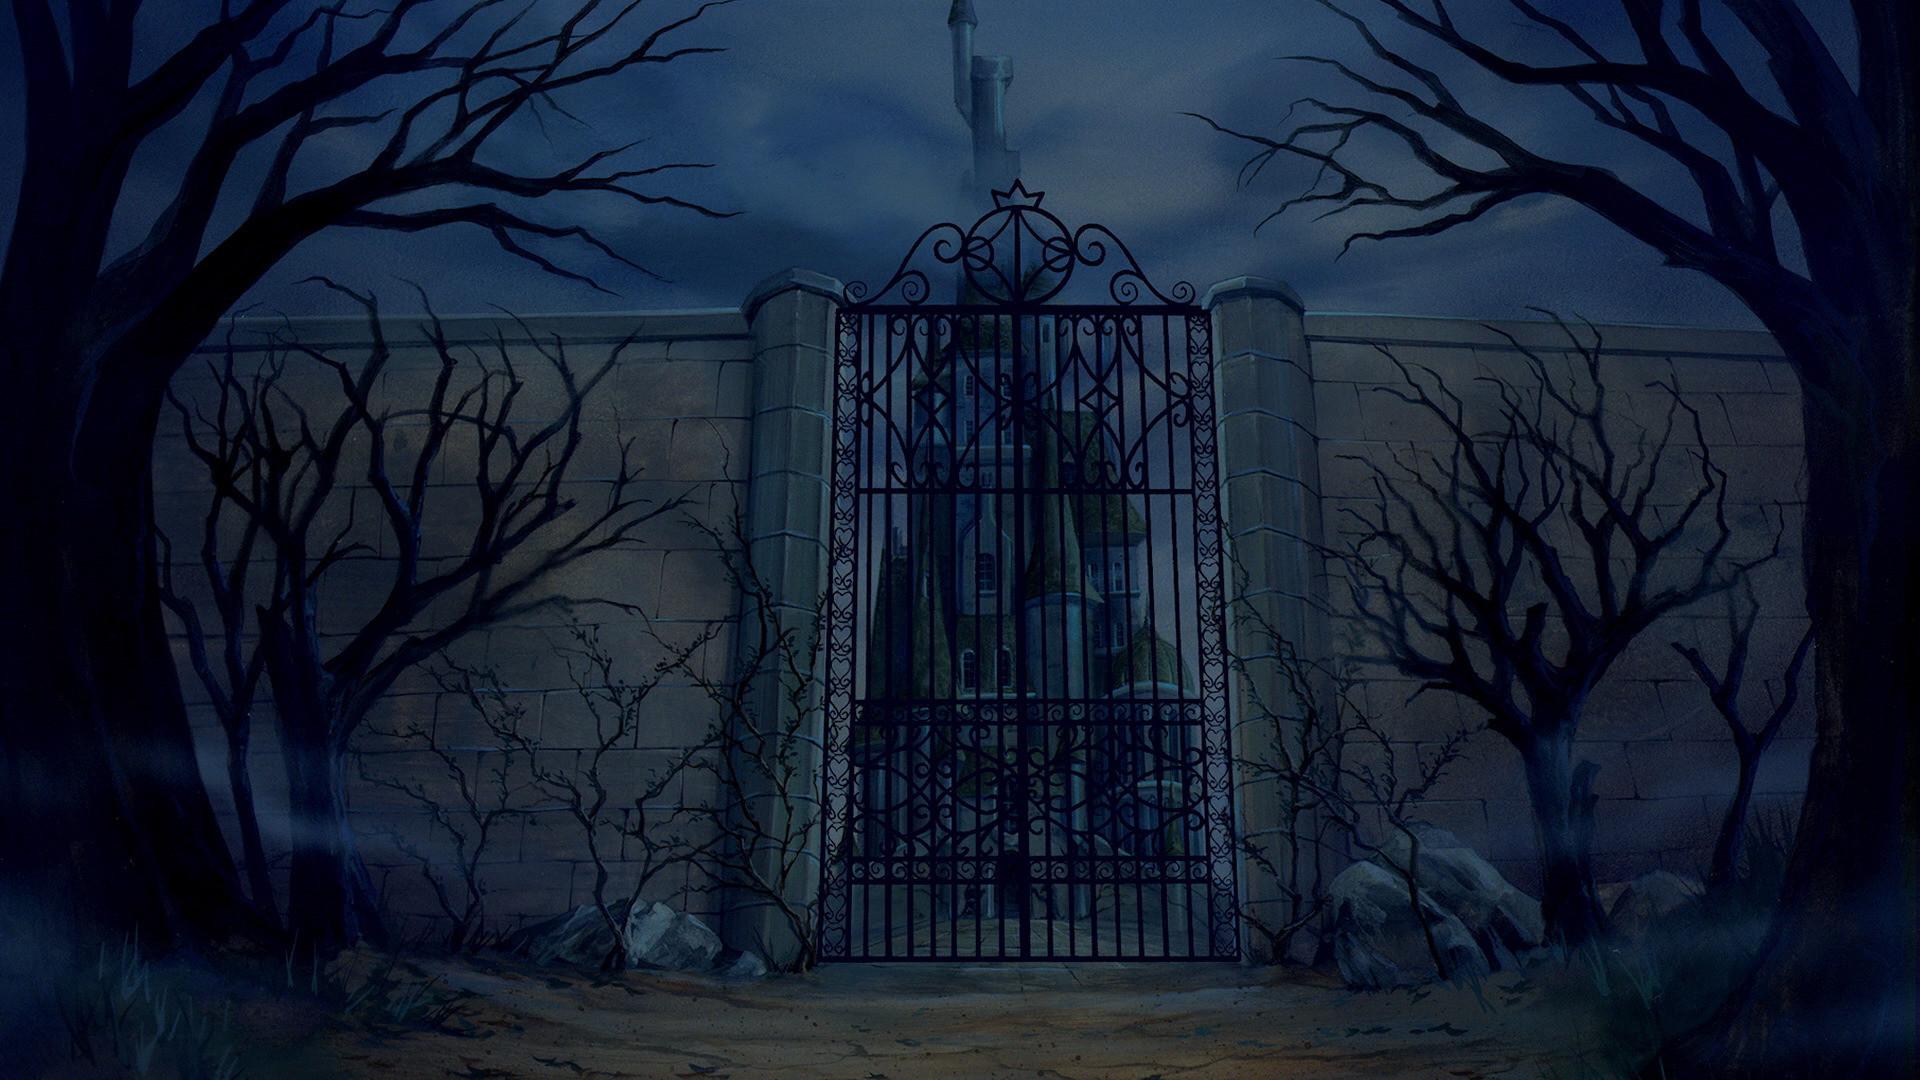 disney haunted mansion at night